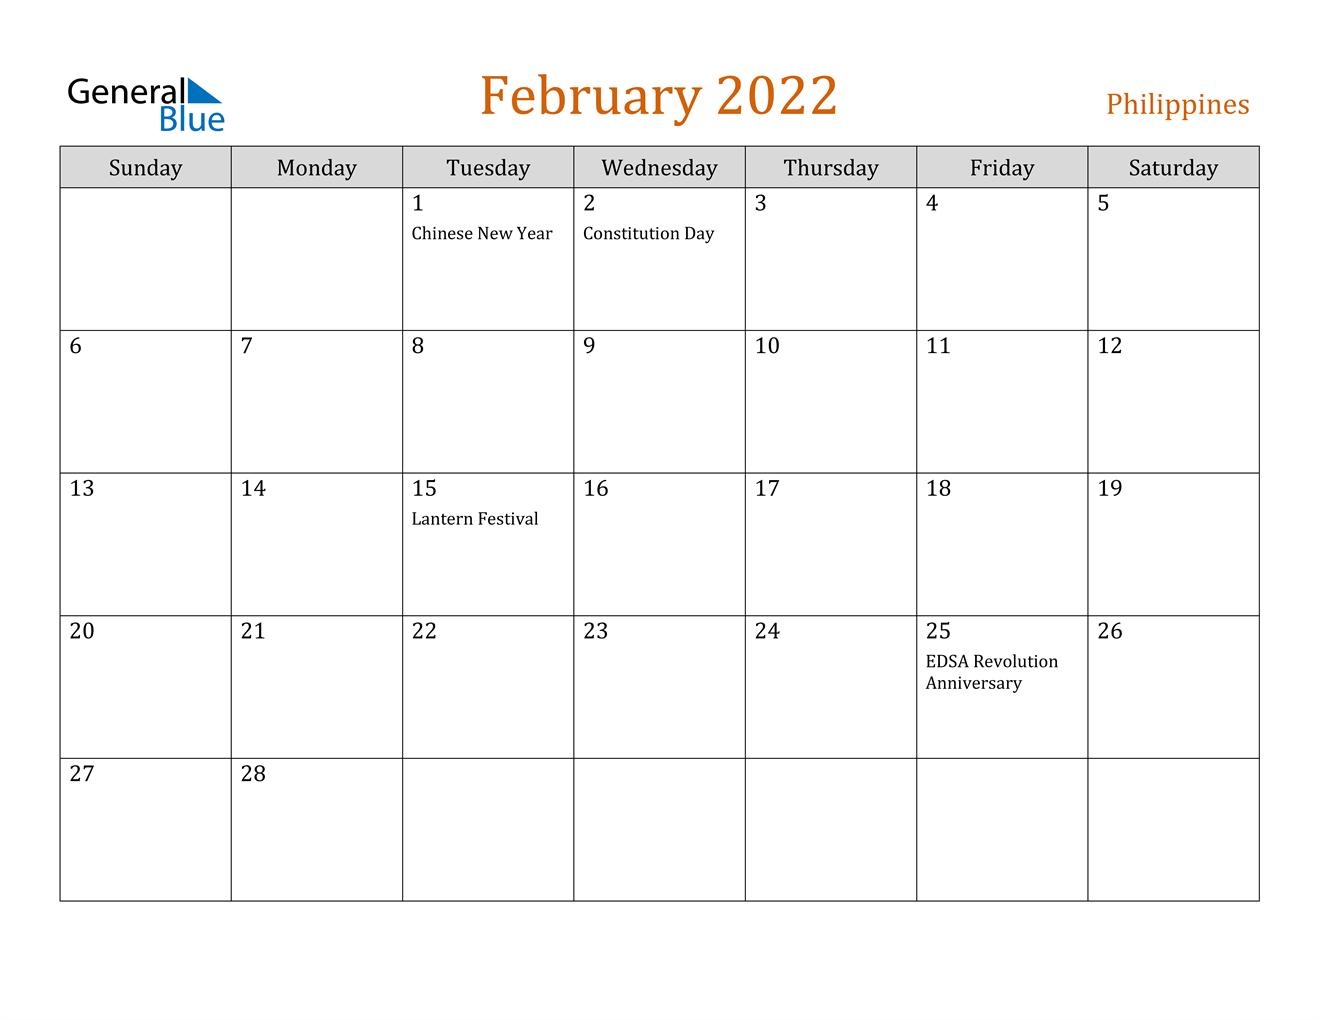 February 2022 Calendar - Philippines regarding Printable Februaryy 2022 Calendar